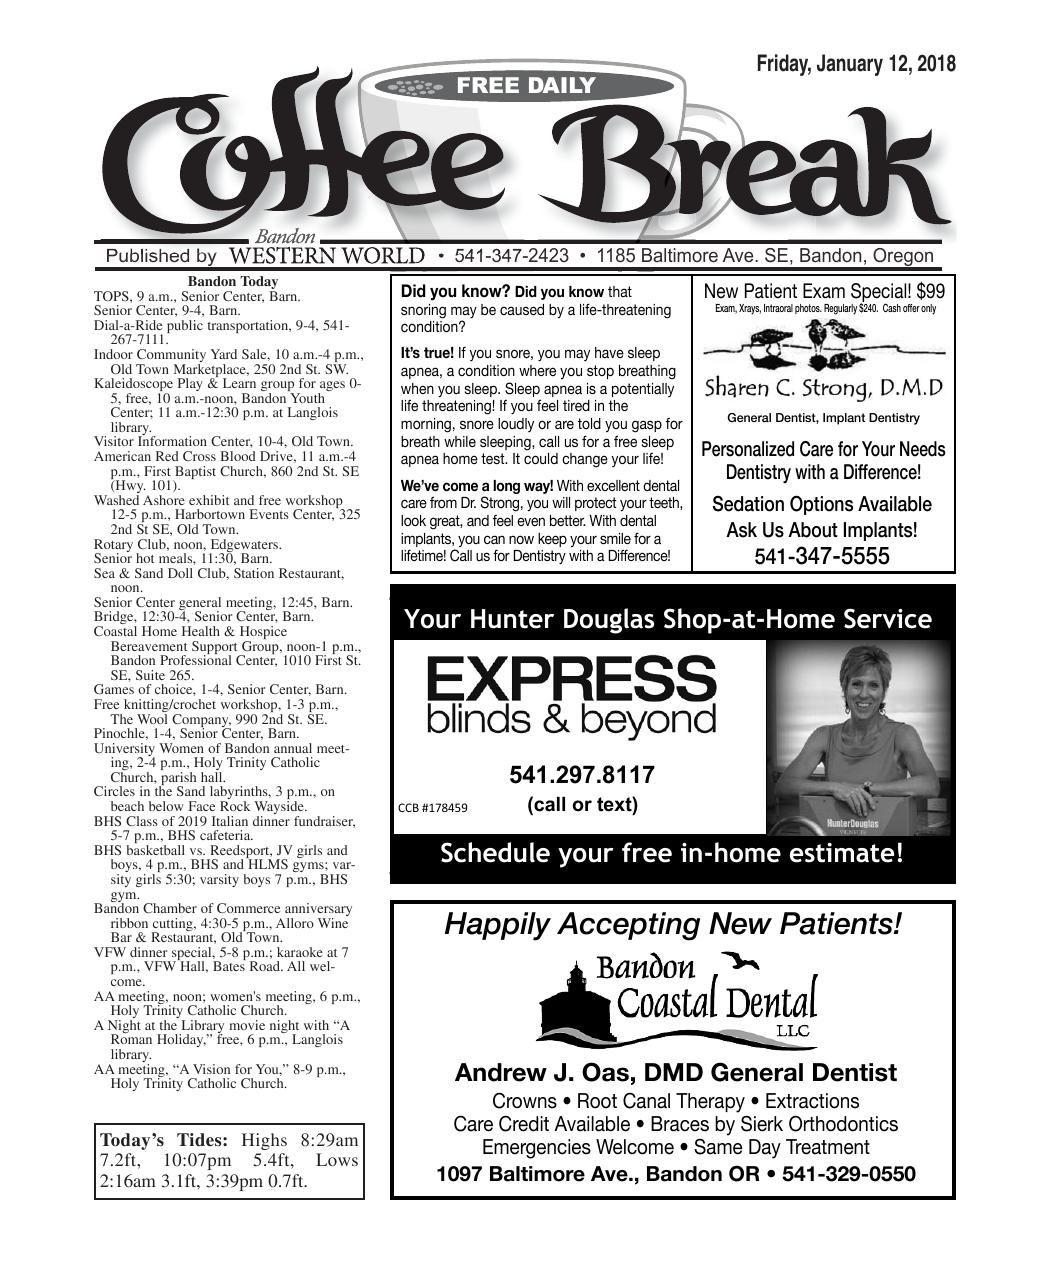 Jan. 12, 2018 Cloffee Break.pdf